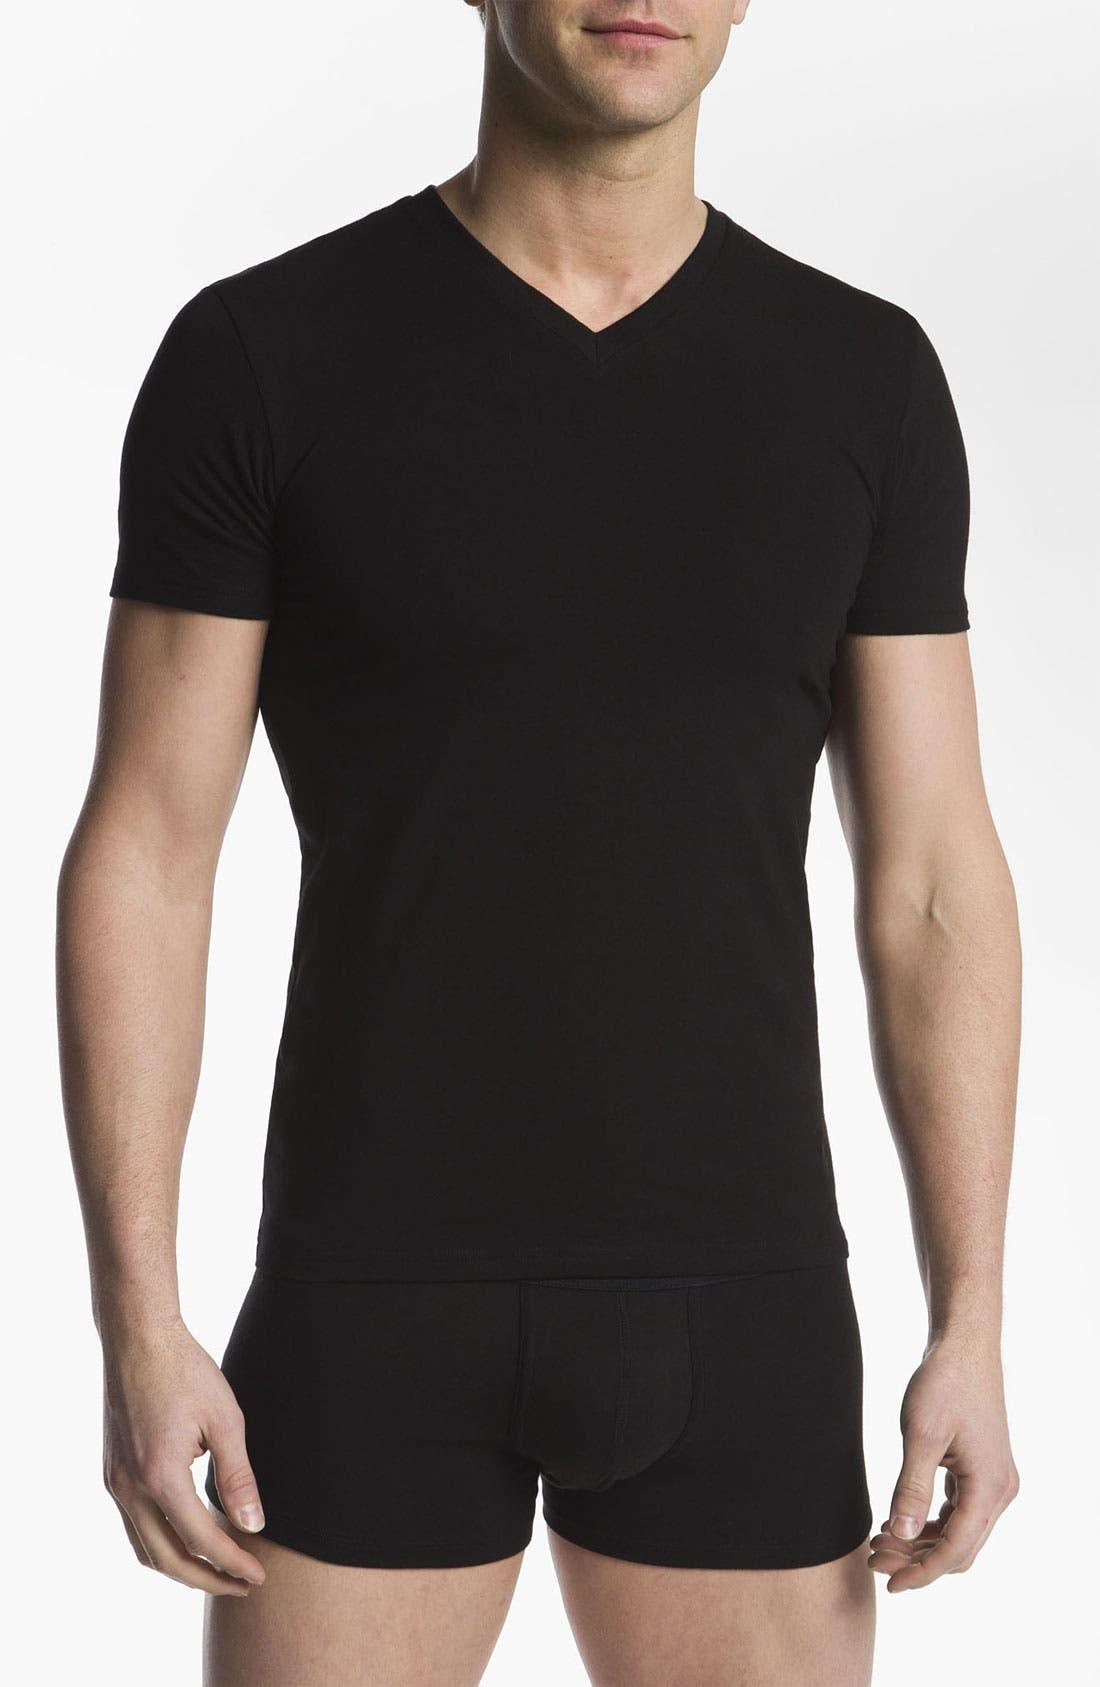 Main Image - Polo Ralph Lauren Stretch Cotton V-Neck T-Shirt (2-Pack)